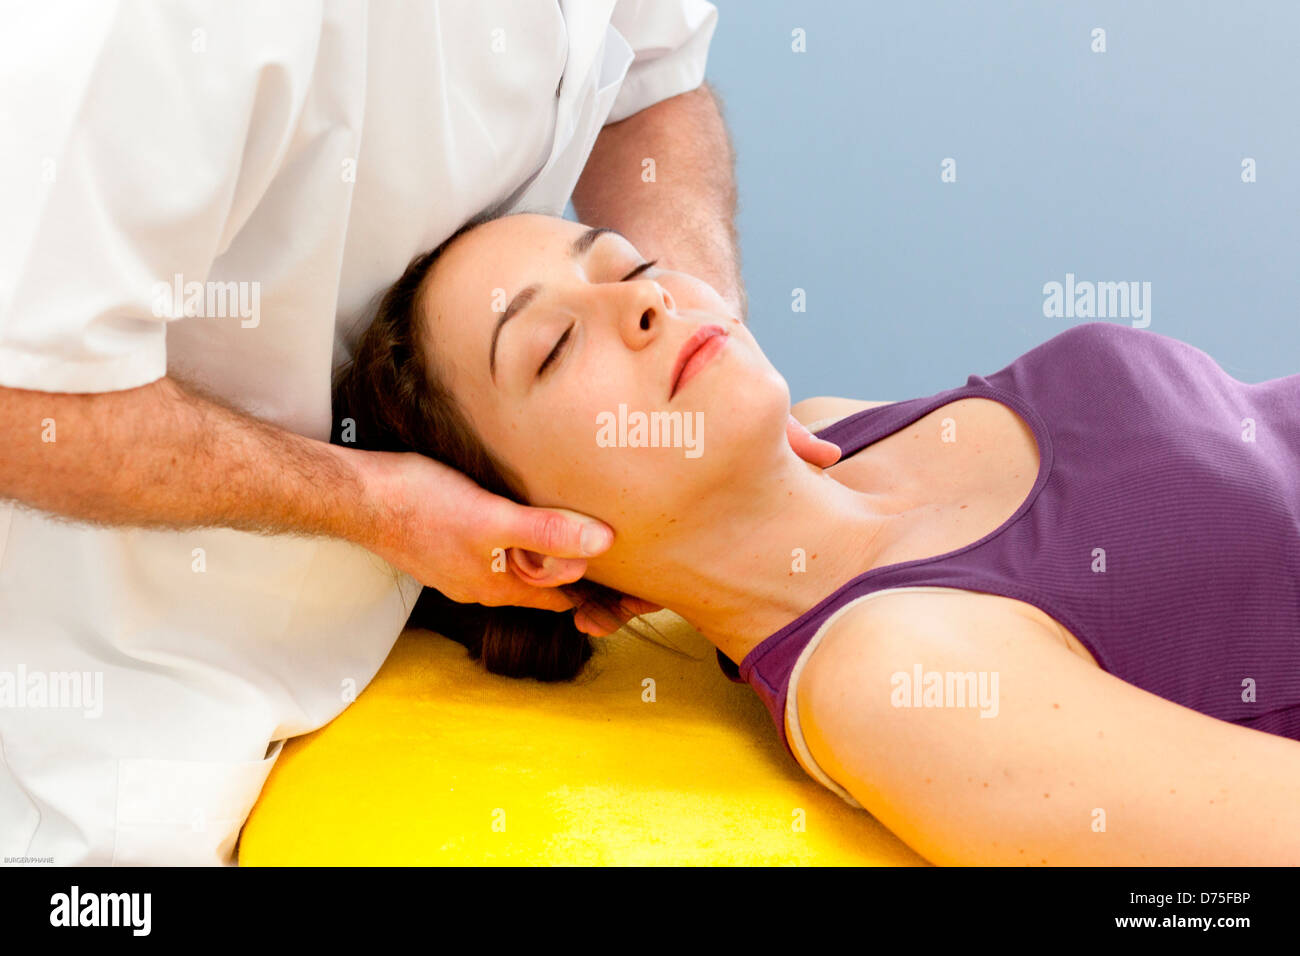 Craniosacral manipulations on a woman. - Stock Image